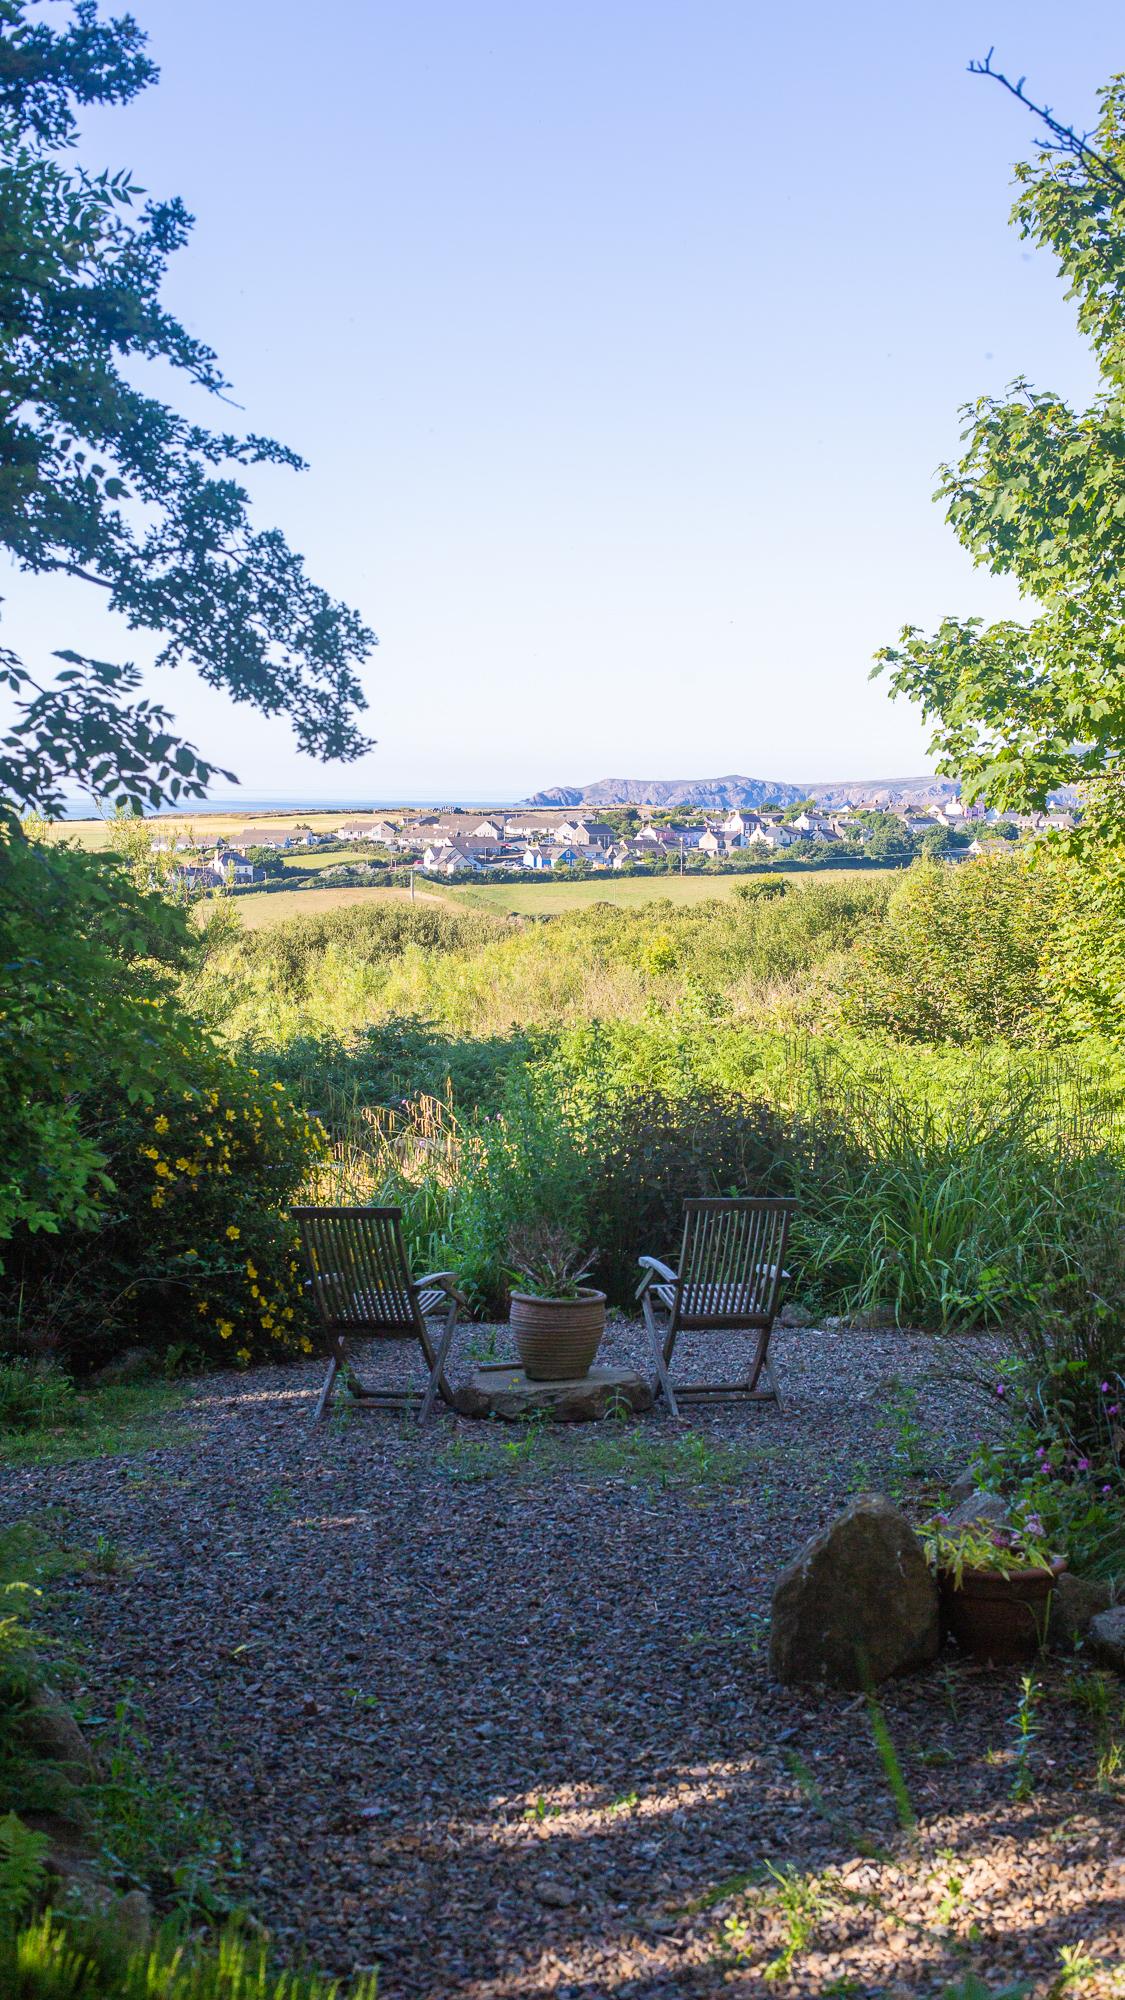 Yr Hafan landscaped gardens and coastal views towards Trefin